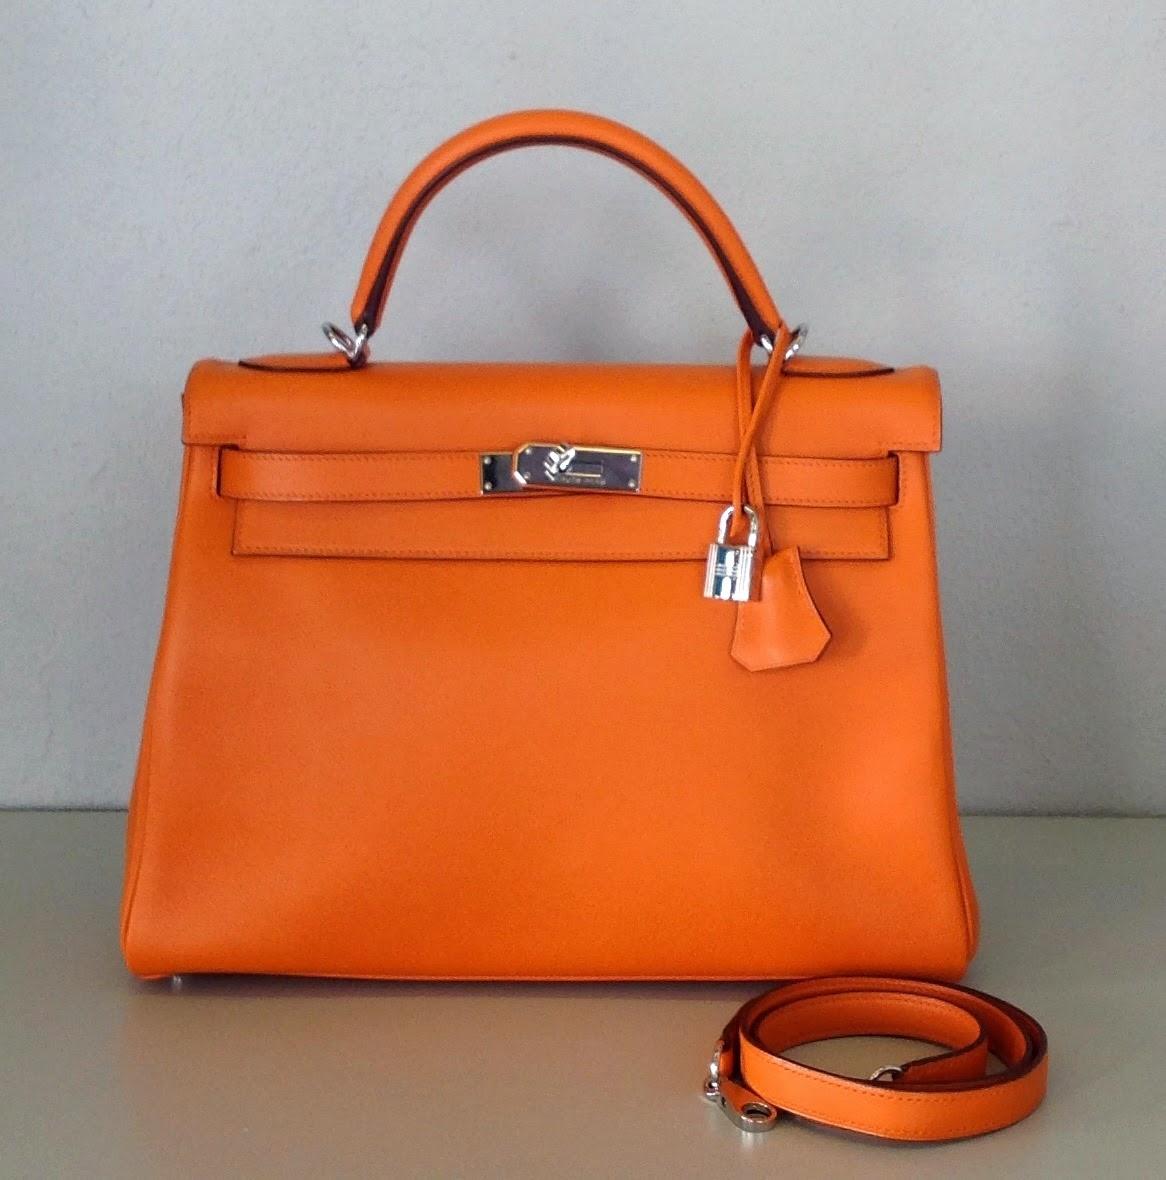 Kelly Hermès orange